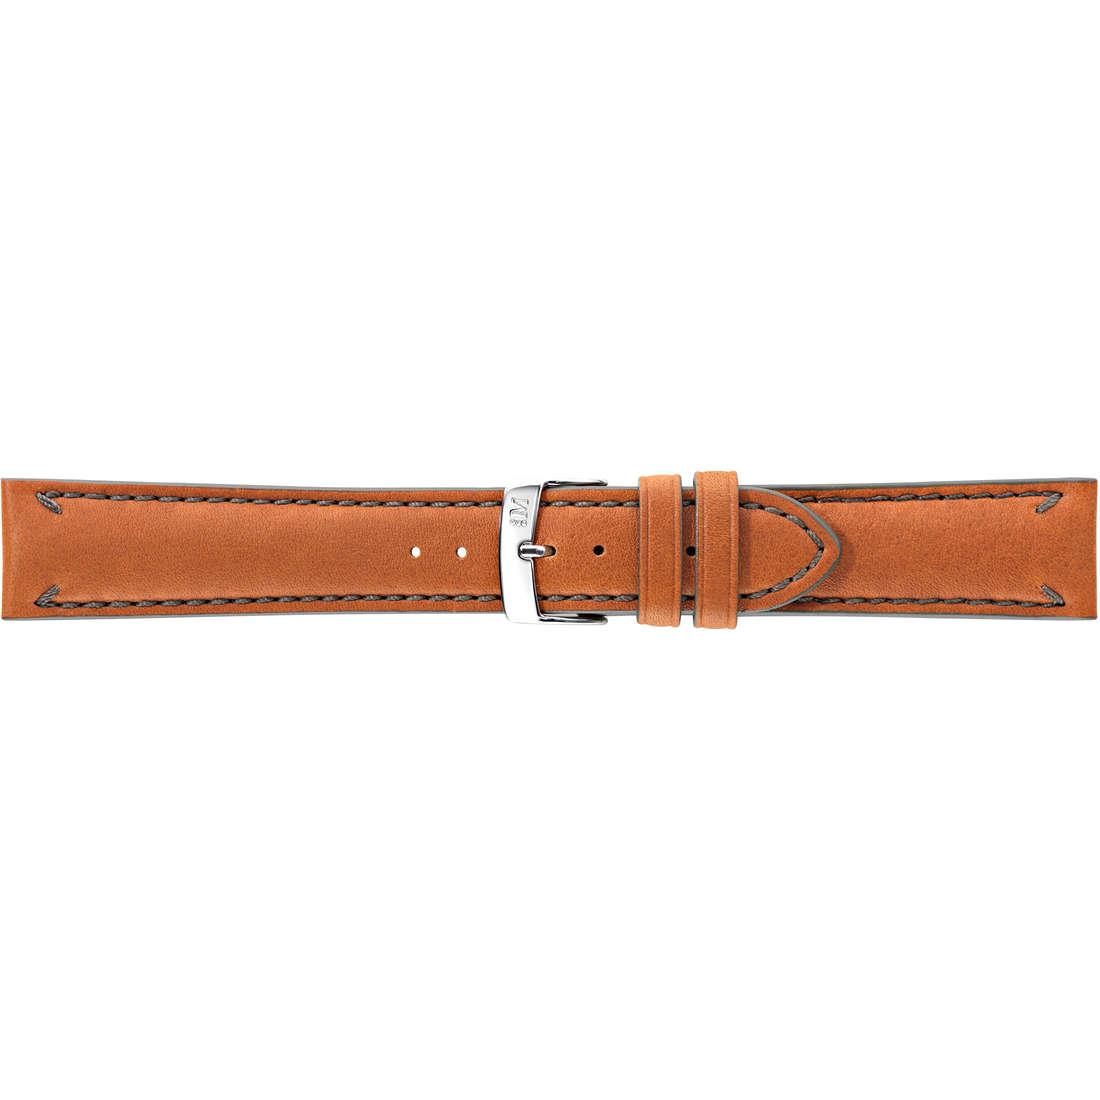 watch watch bands watch straps man Morellato Manufatti A01X4540A61044CR22